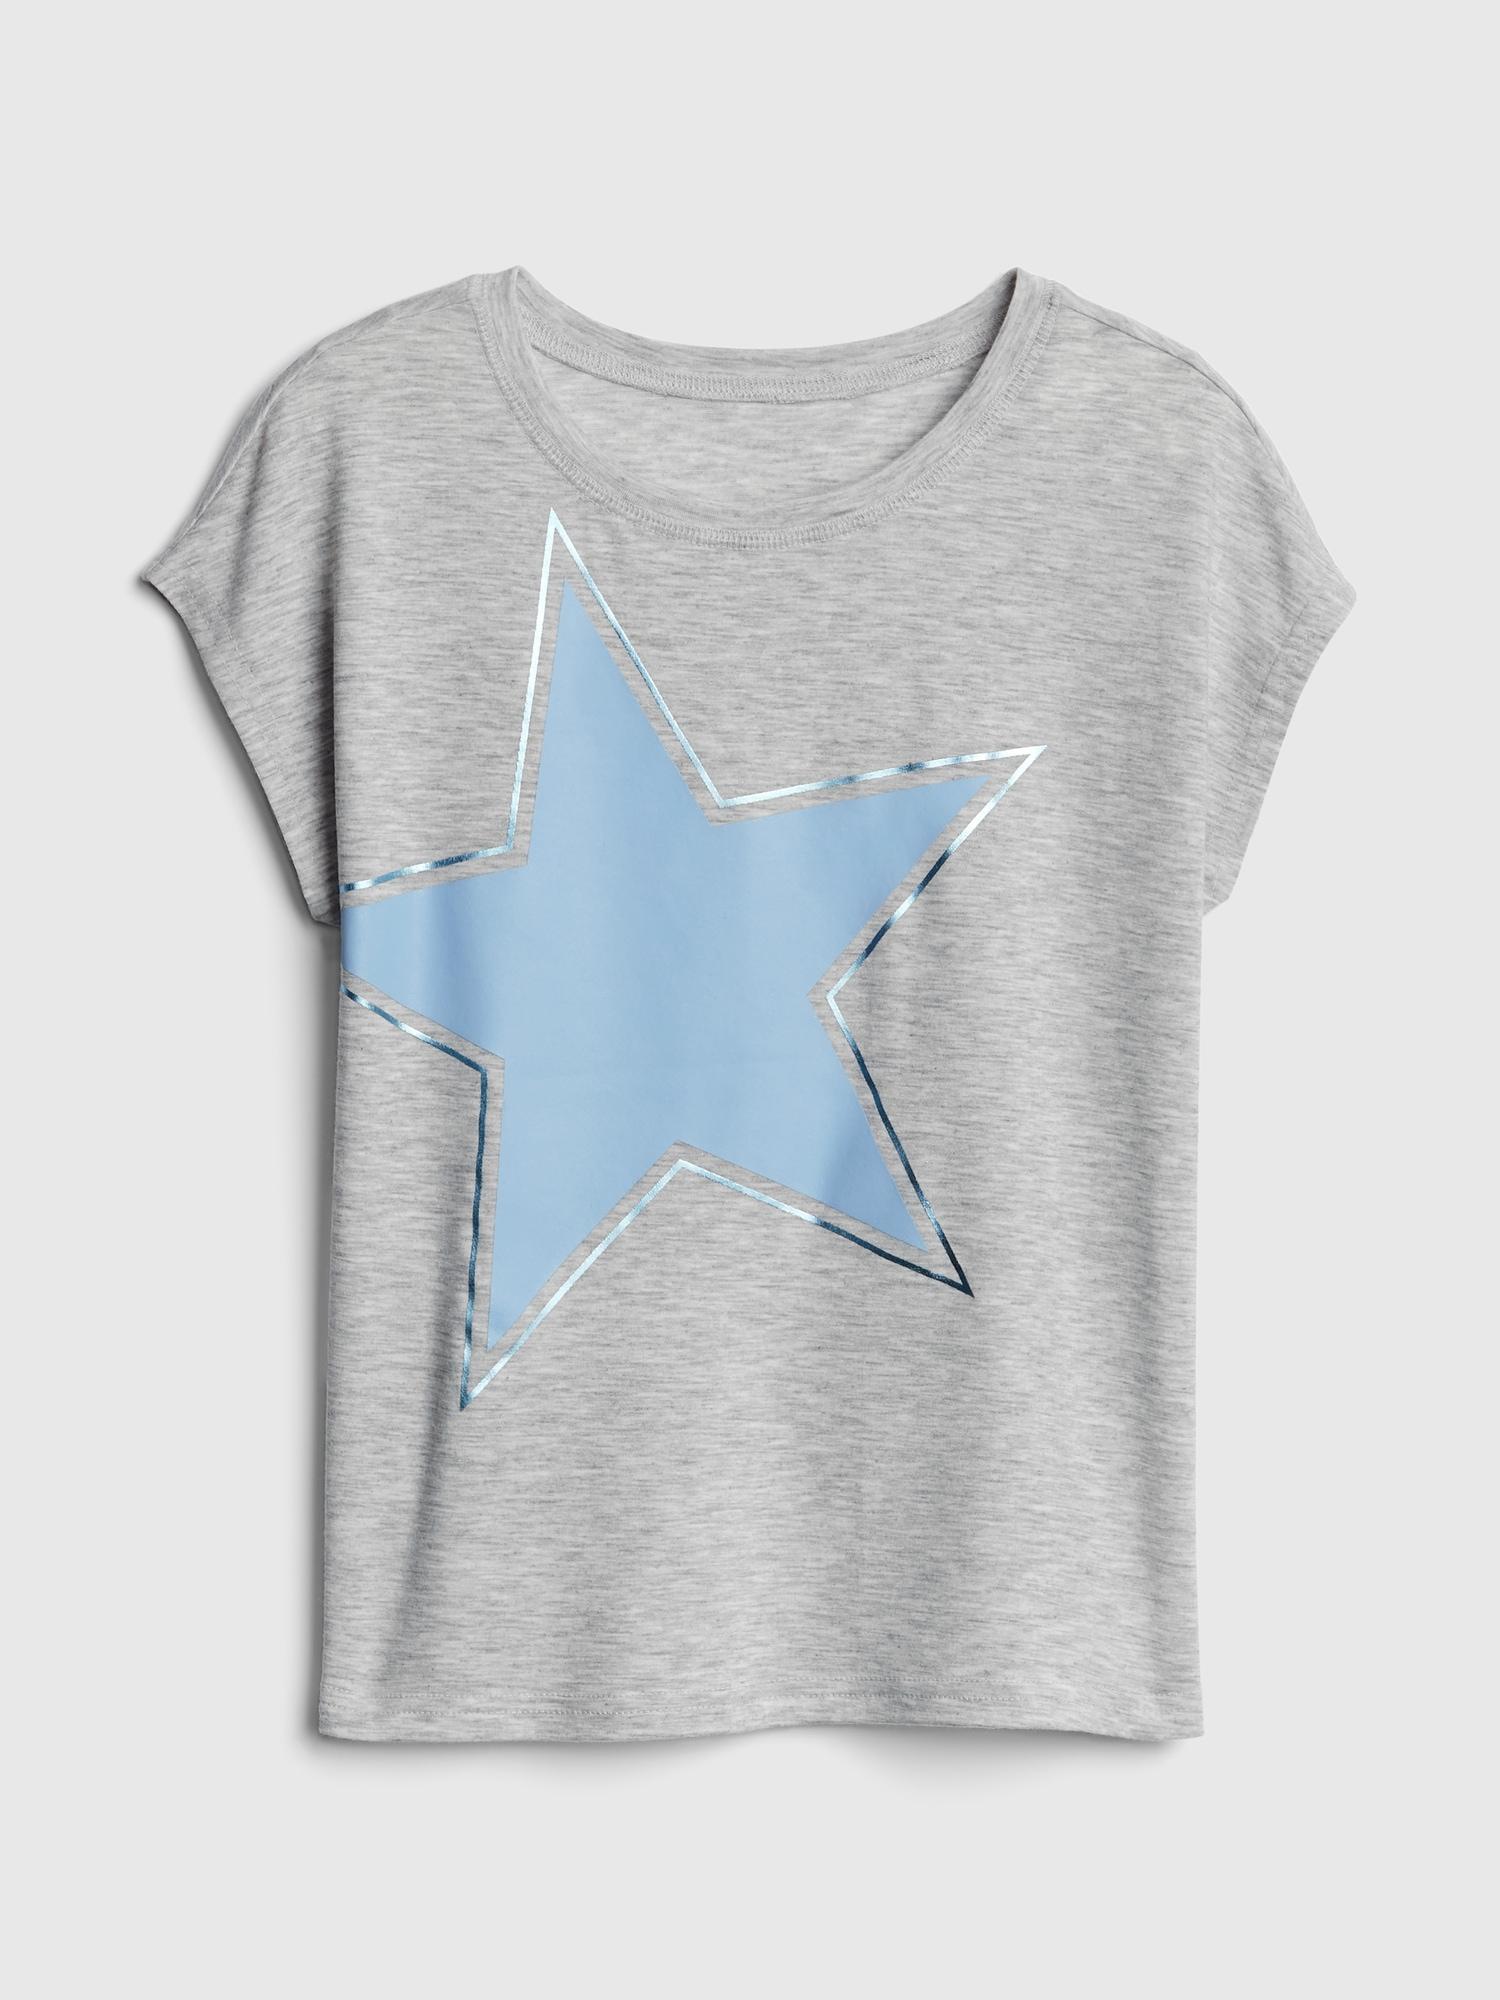 584e3e7f991e GapFit Kids Short Sleeve T-Shirt | Gap